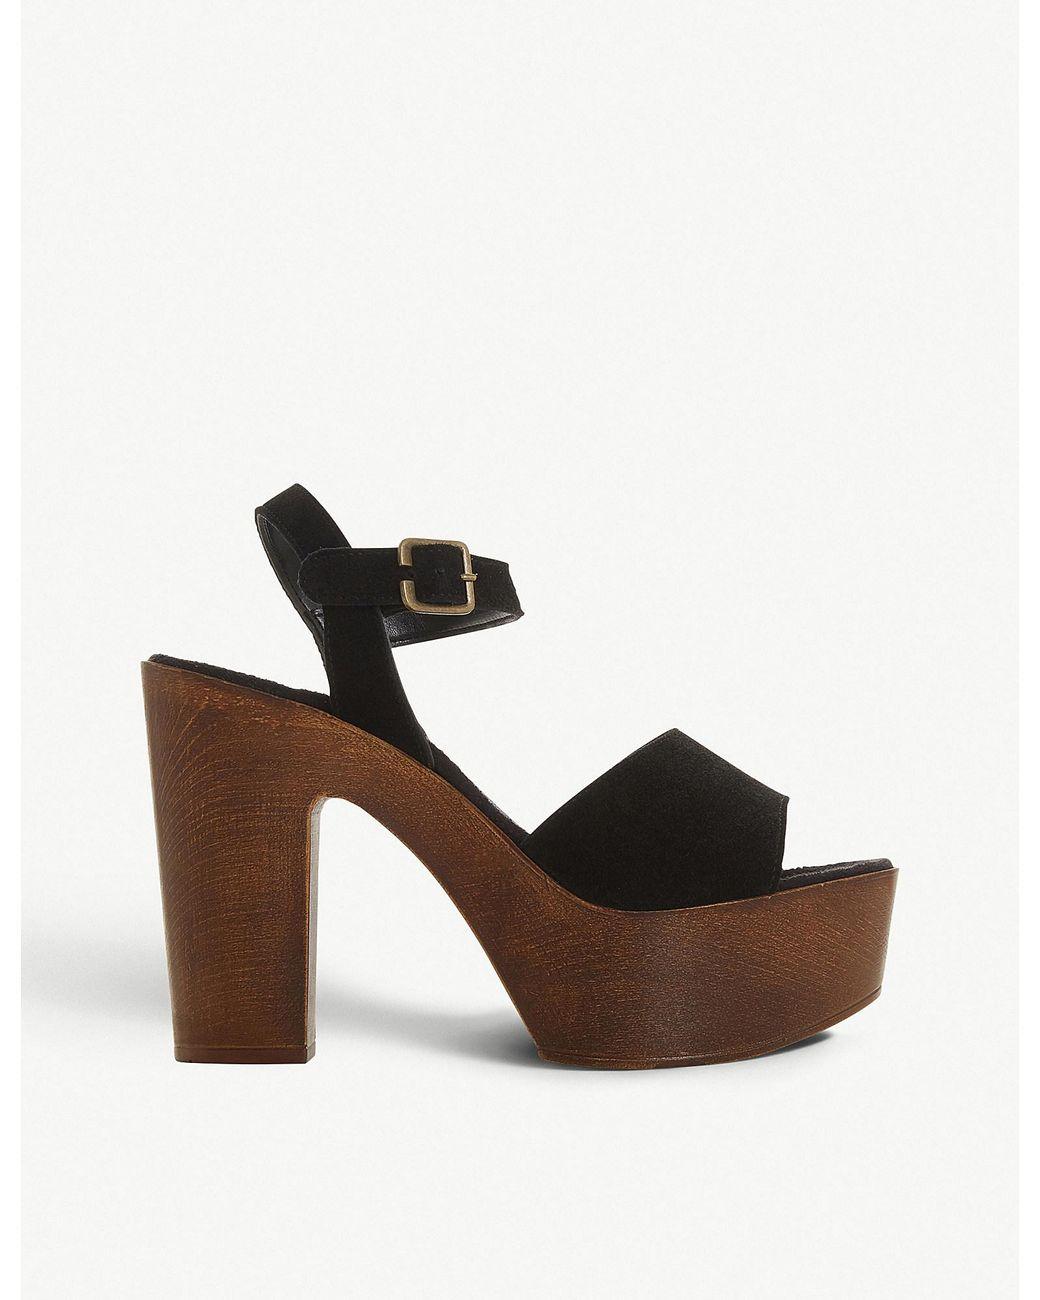 4e70f0606ff Steve Madden Lulla Block Heel Suede Sandals in Black - Lyst